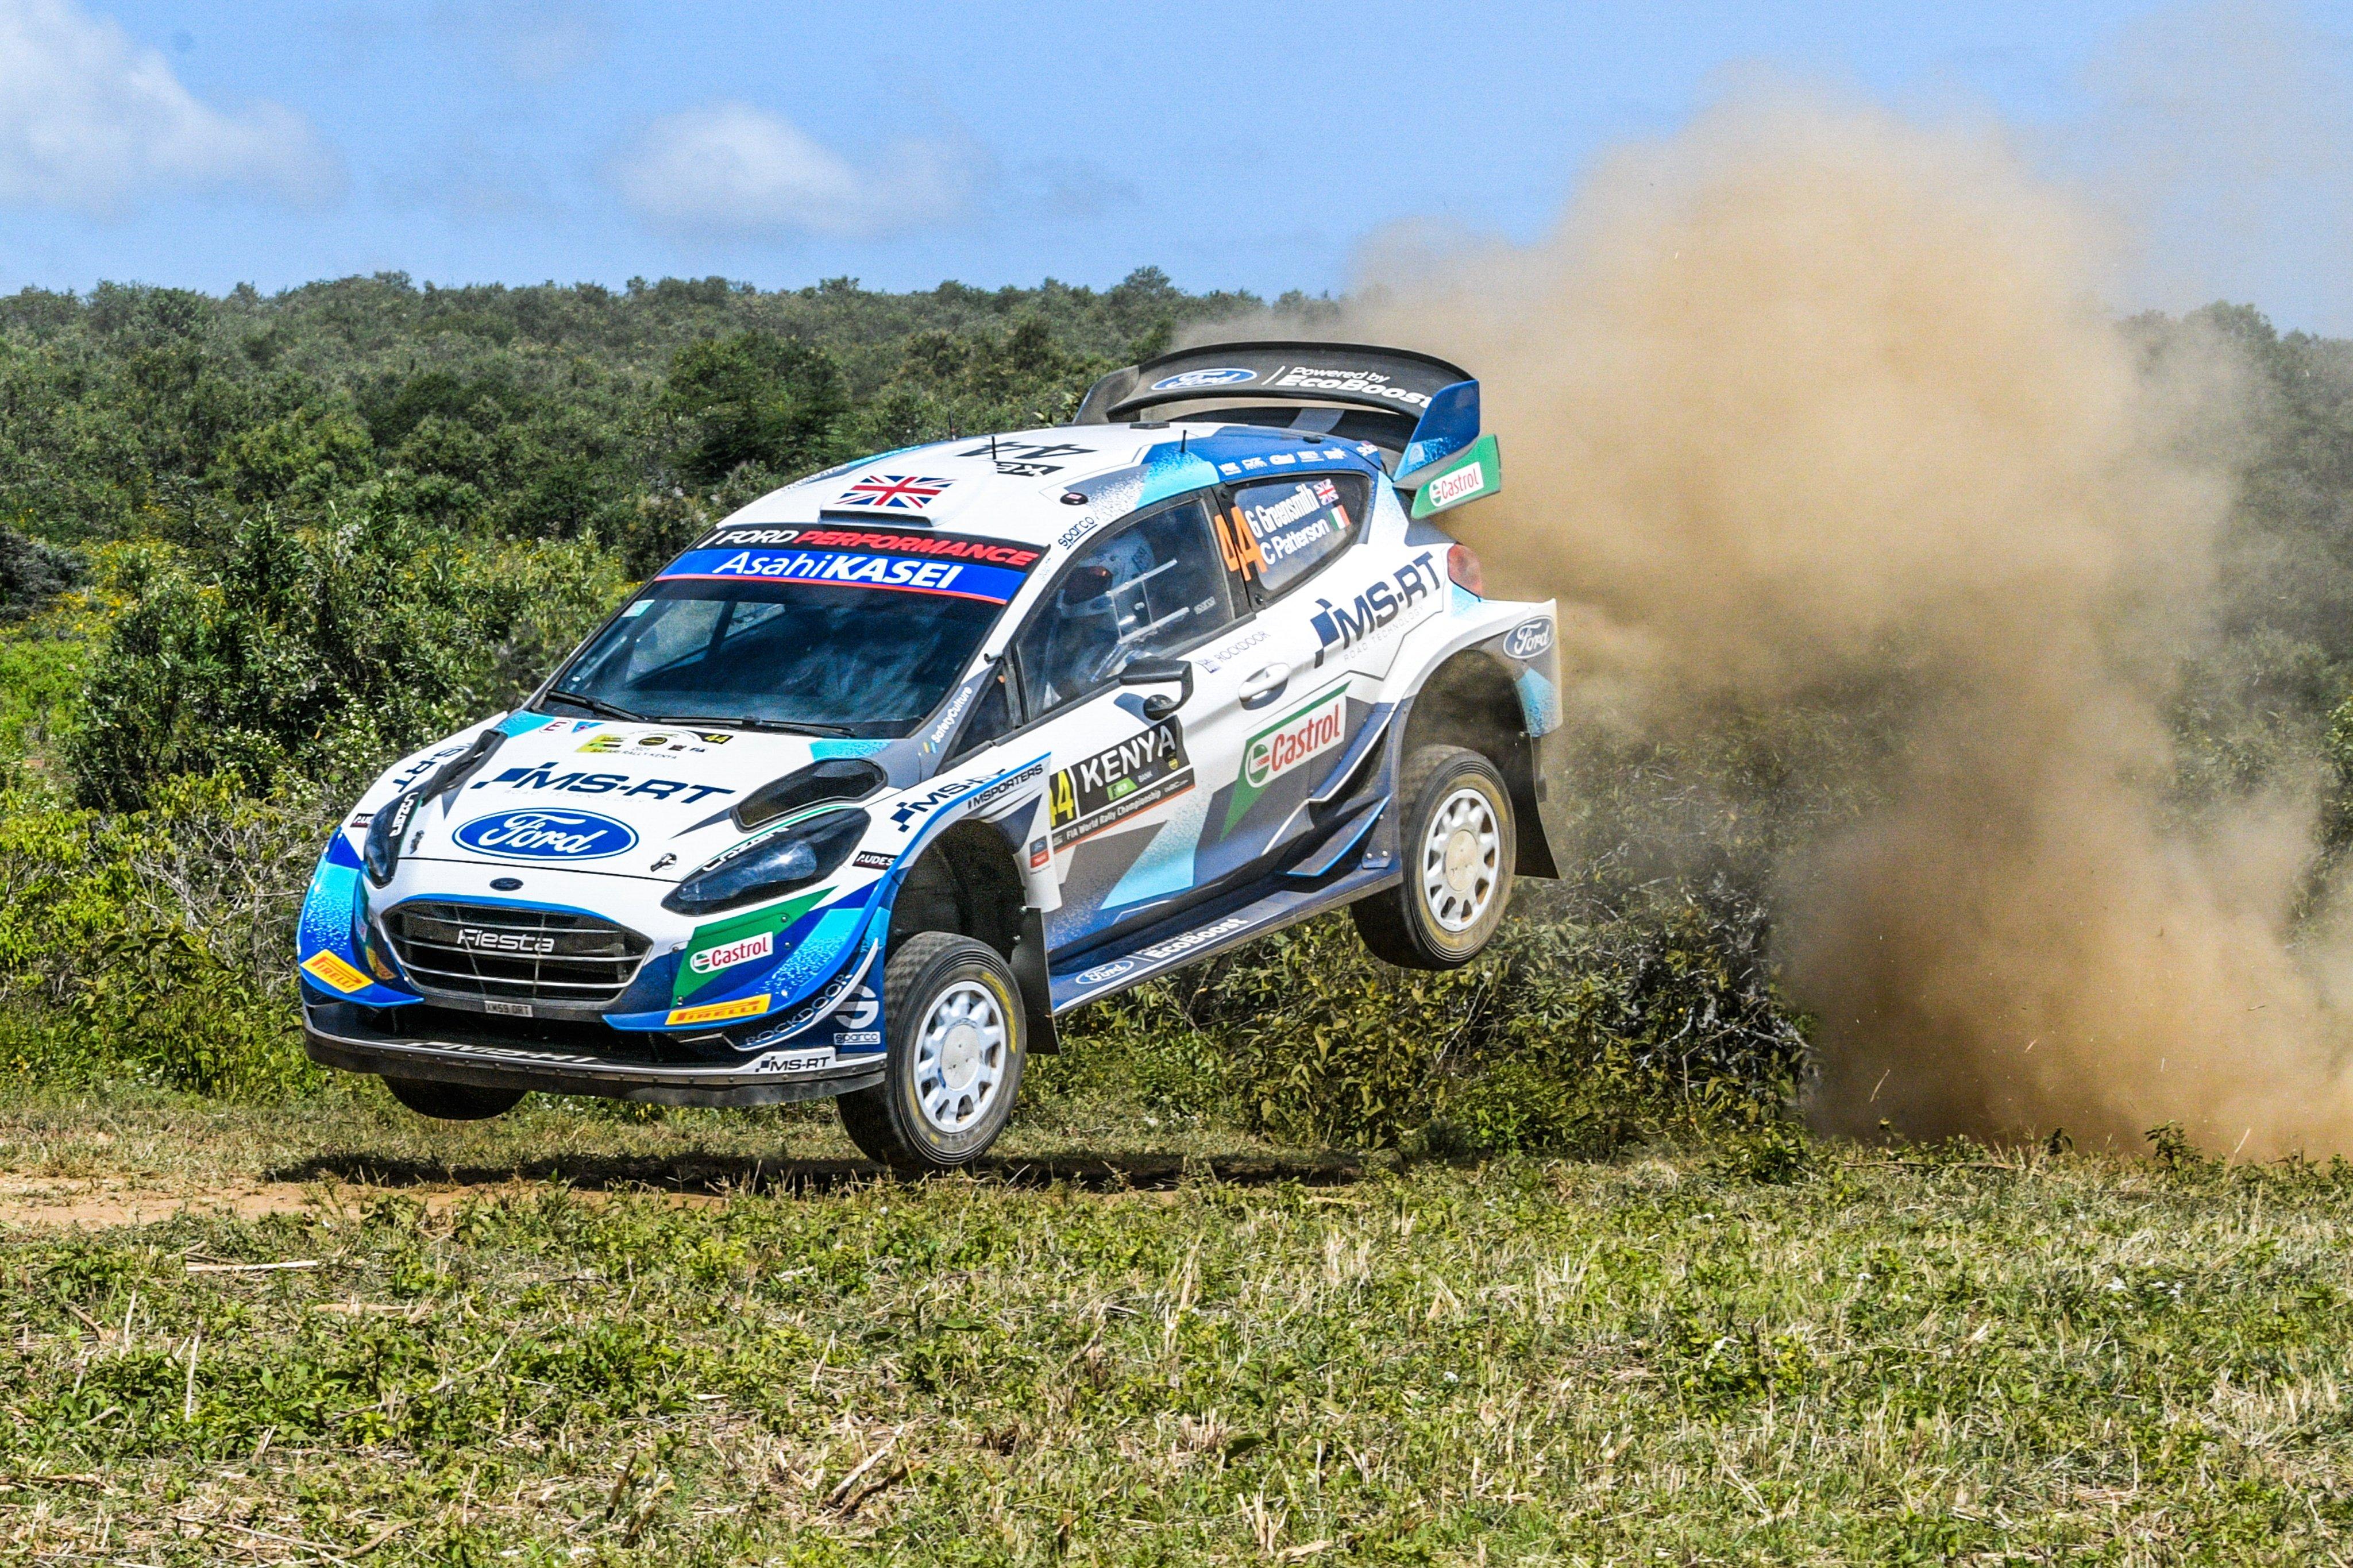 WRC: Safari Rally Kenya [23-27 Junio] - Página 4 E4umwAWXMAIM-51?format=jpg&name=4096x4096